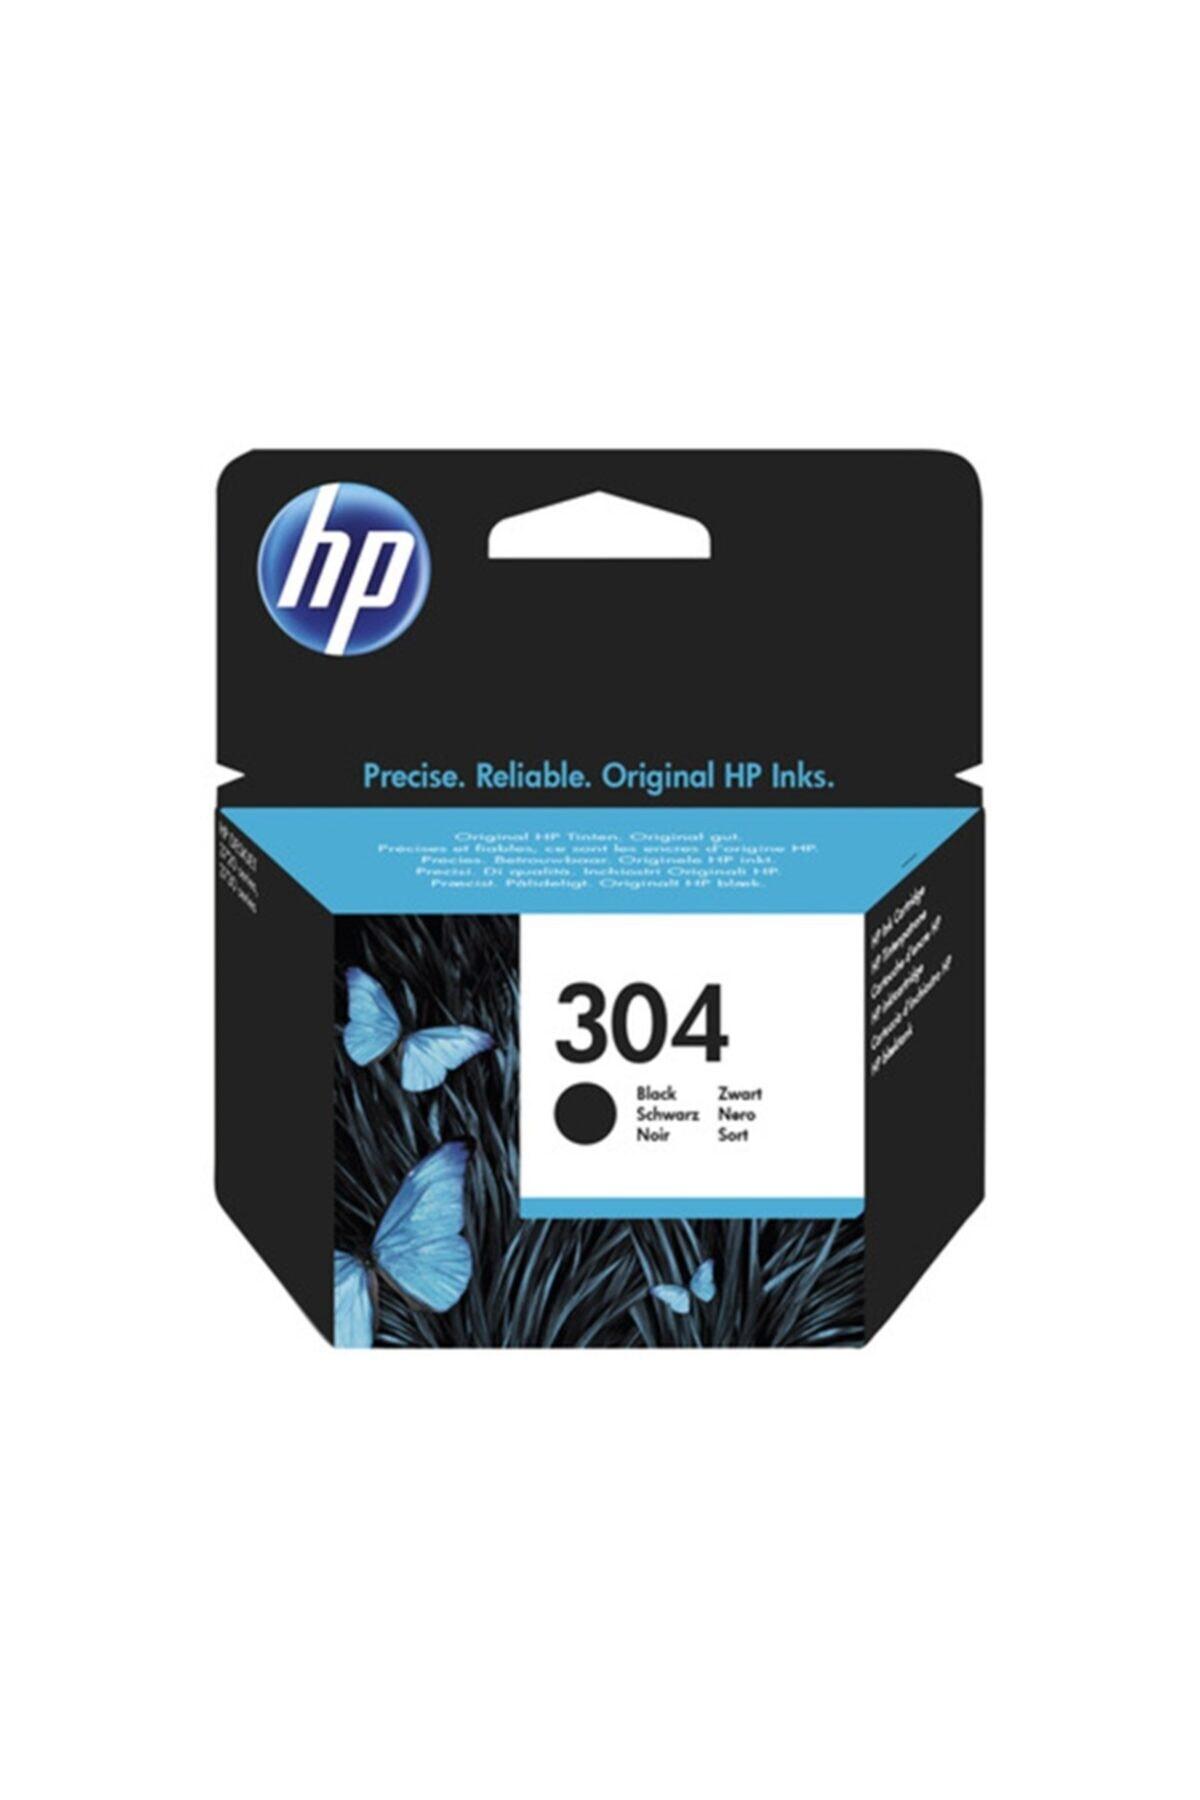 HP 304 Black Siyah Kartuş N9k06ae 1